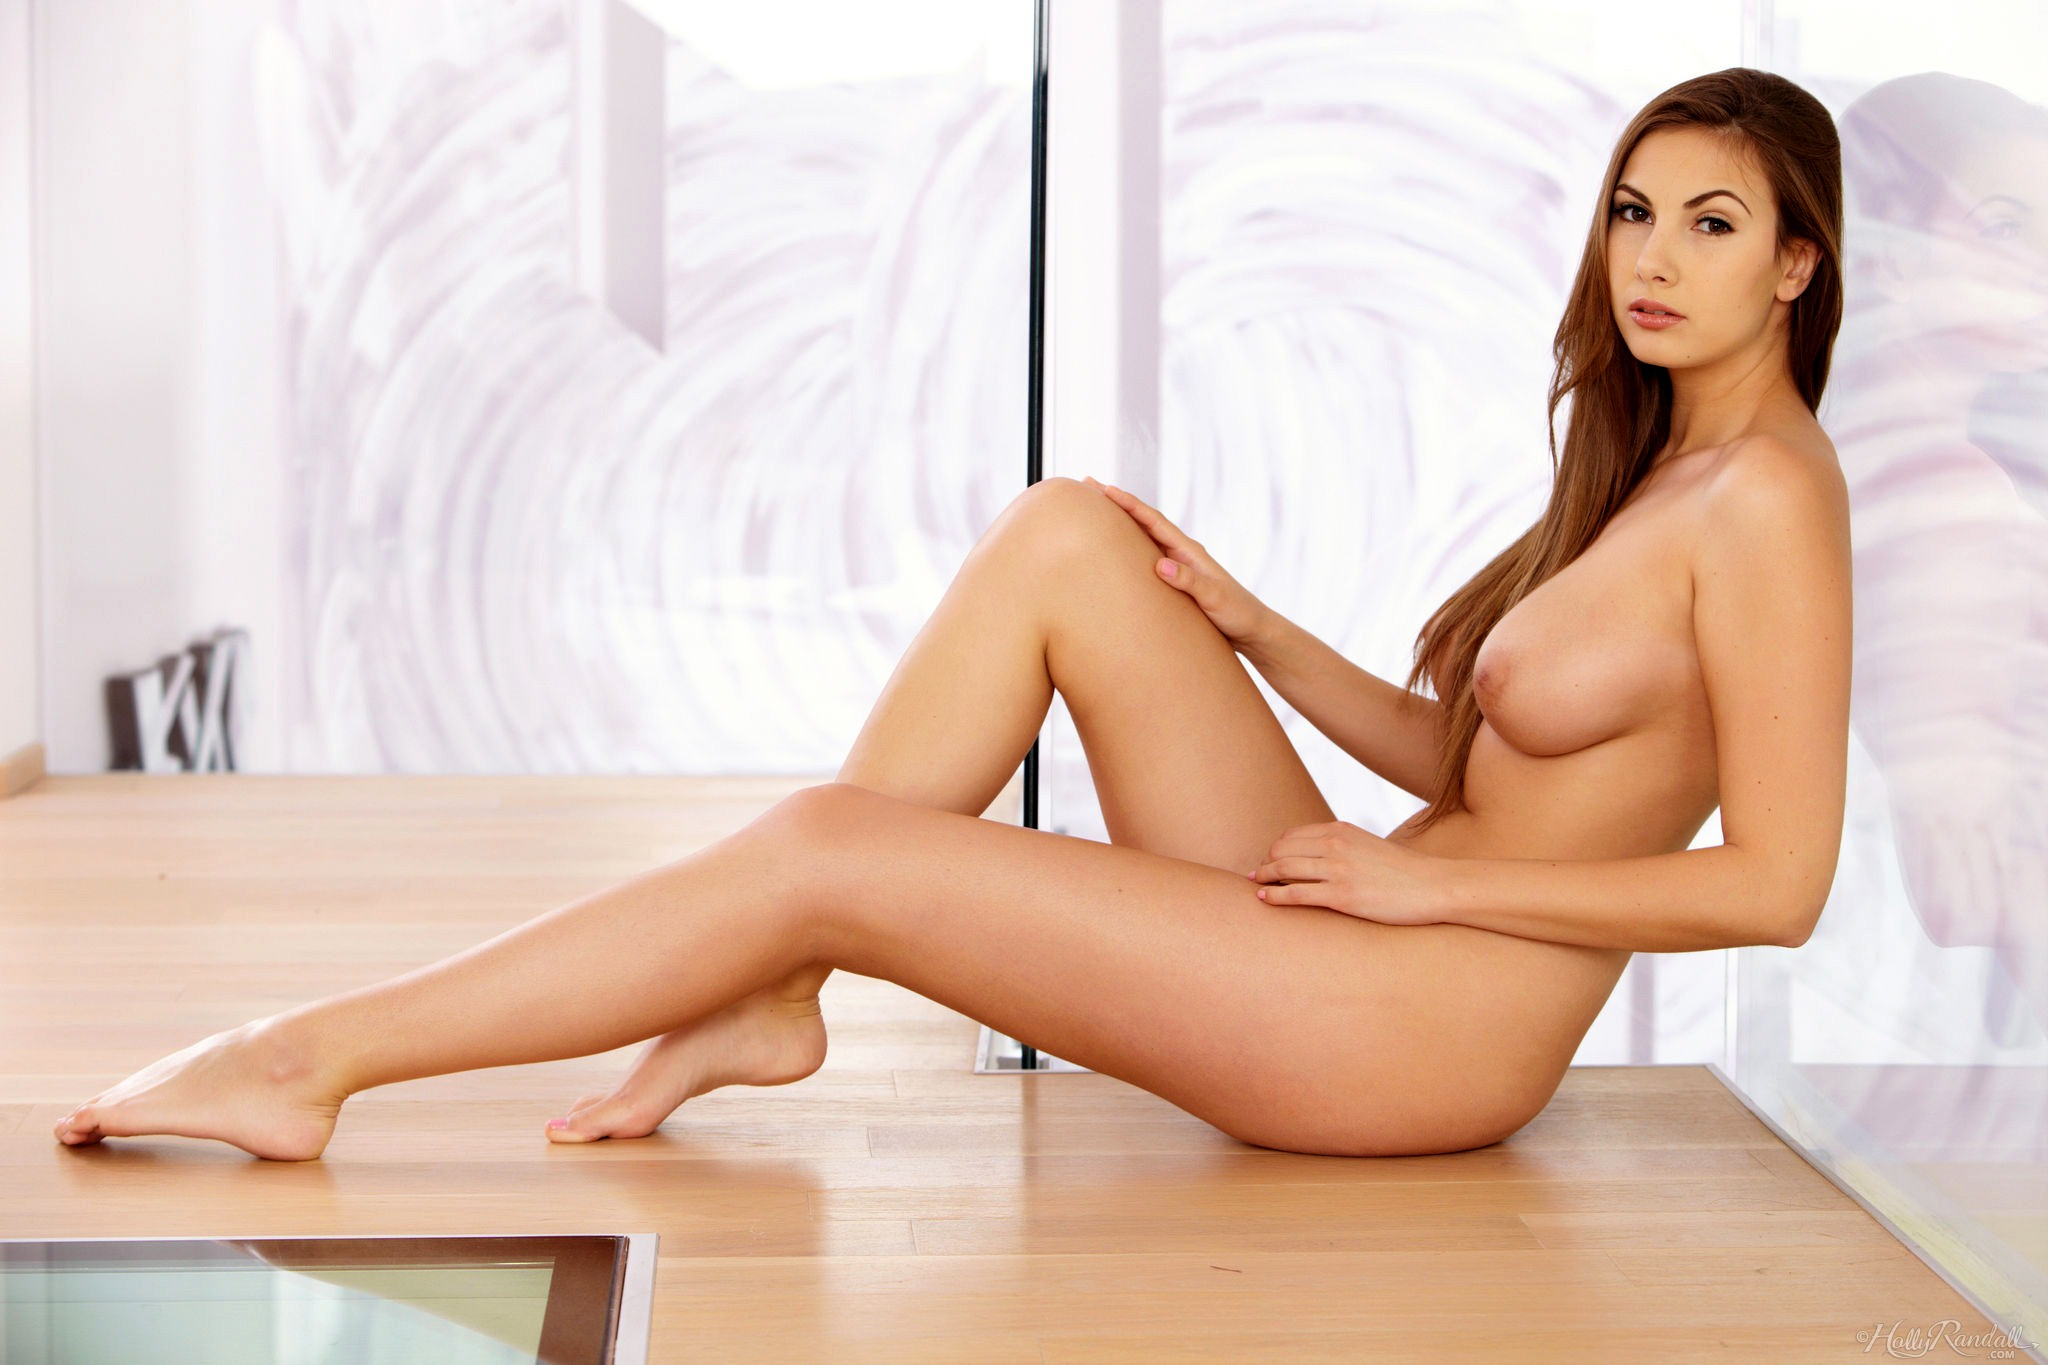 connie-carter-nude-model